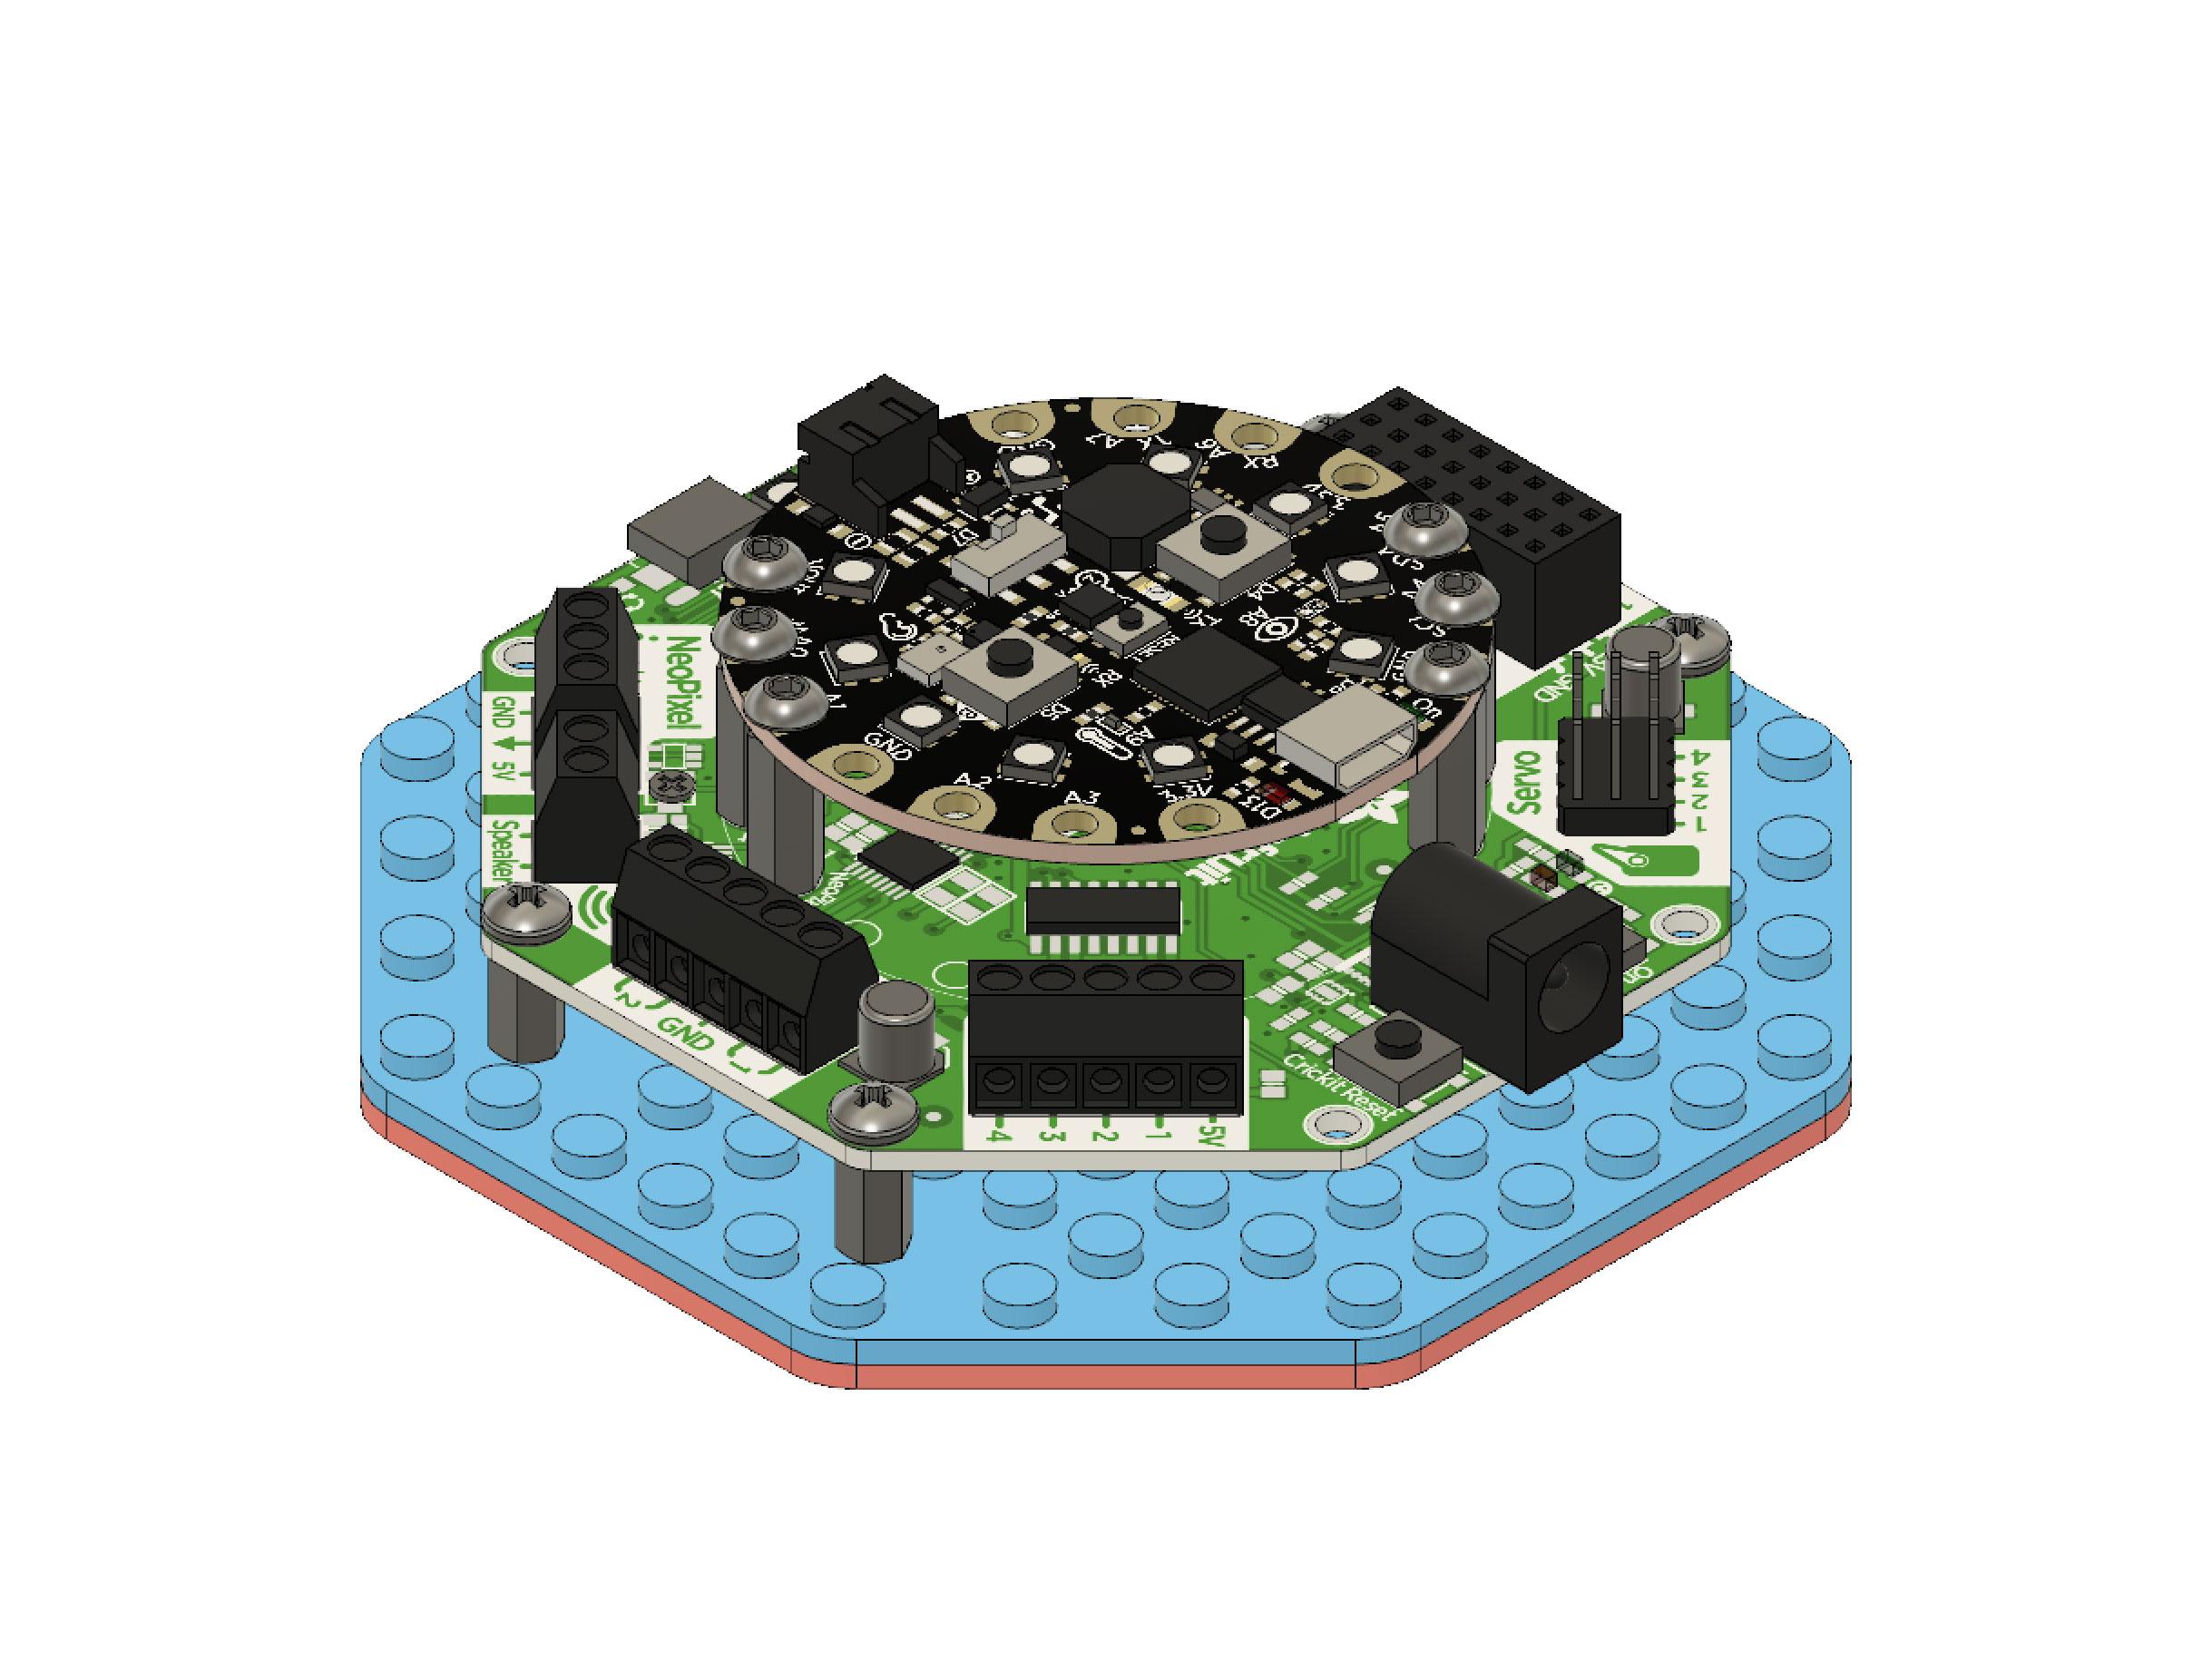 3d_printing_cad-crik-lego-plate.jpg